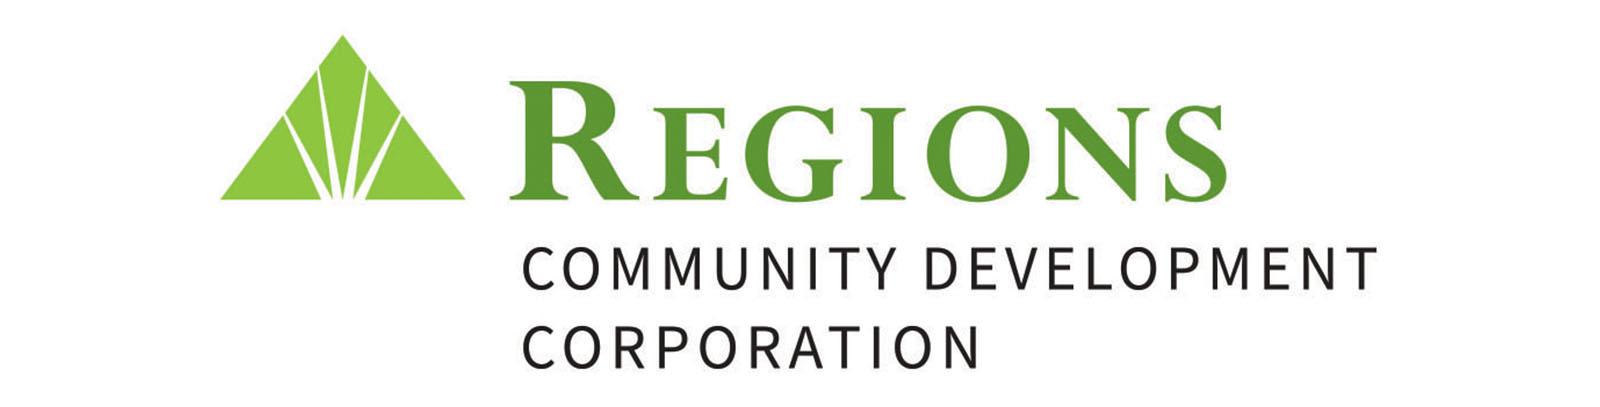 Regions Community Development Corporation